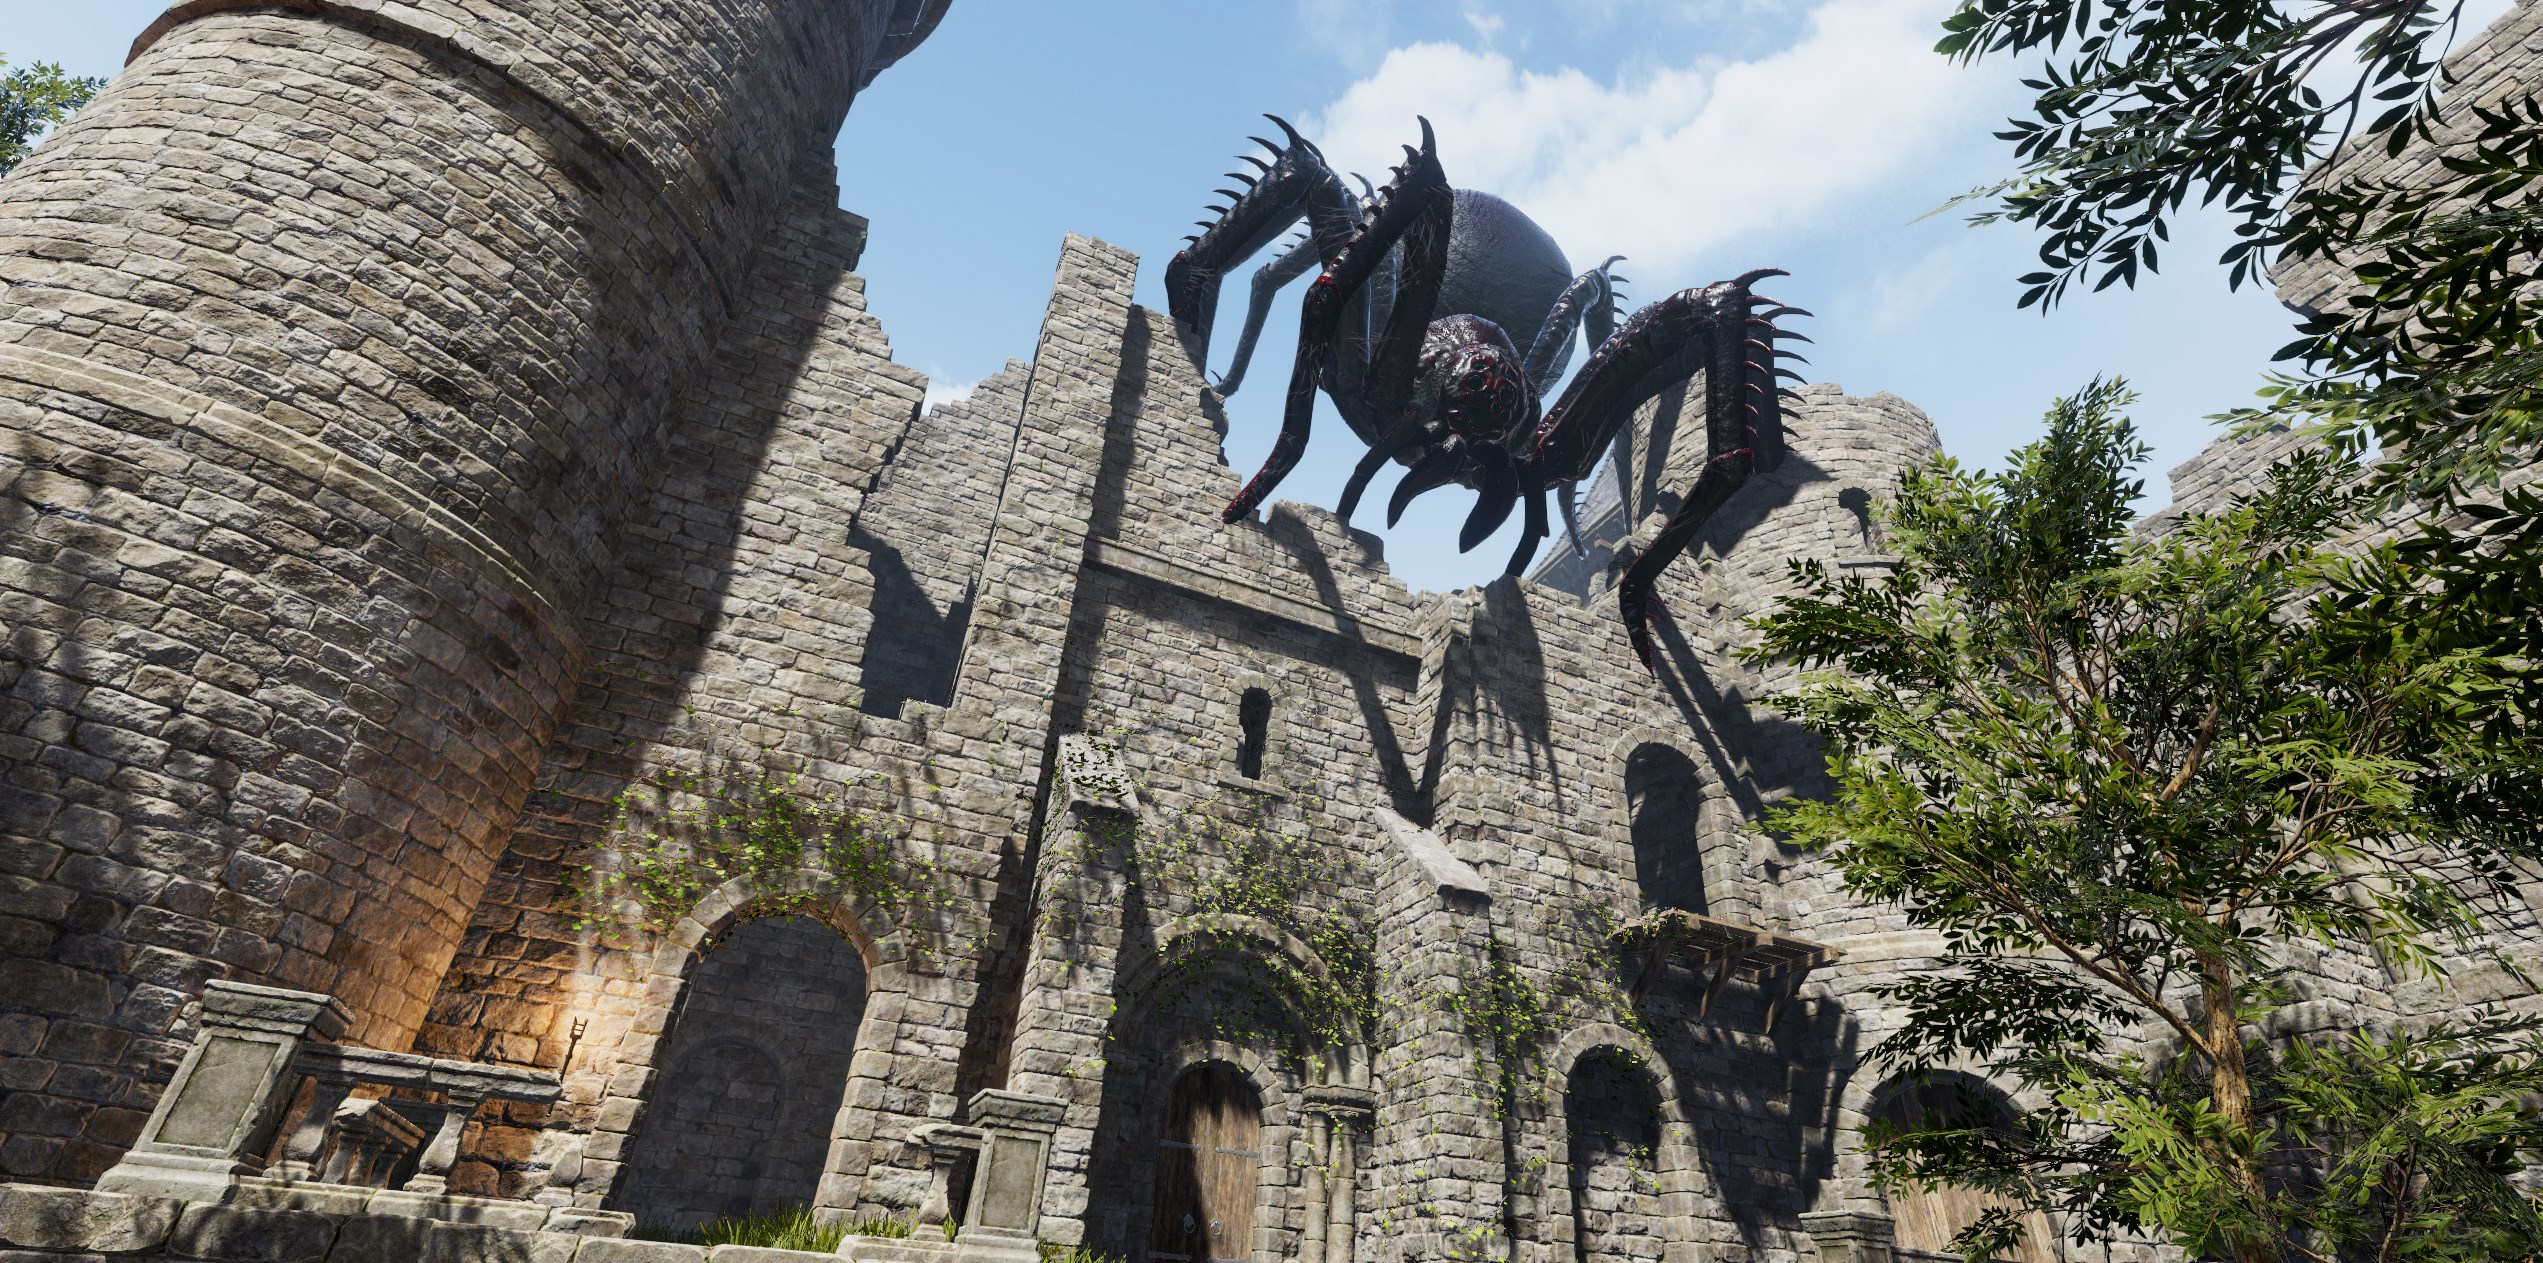 creepy spider 1.jpg